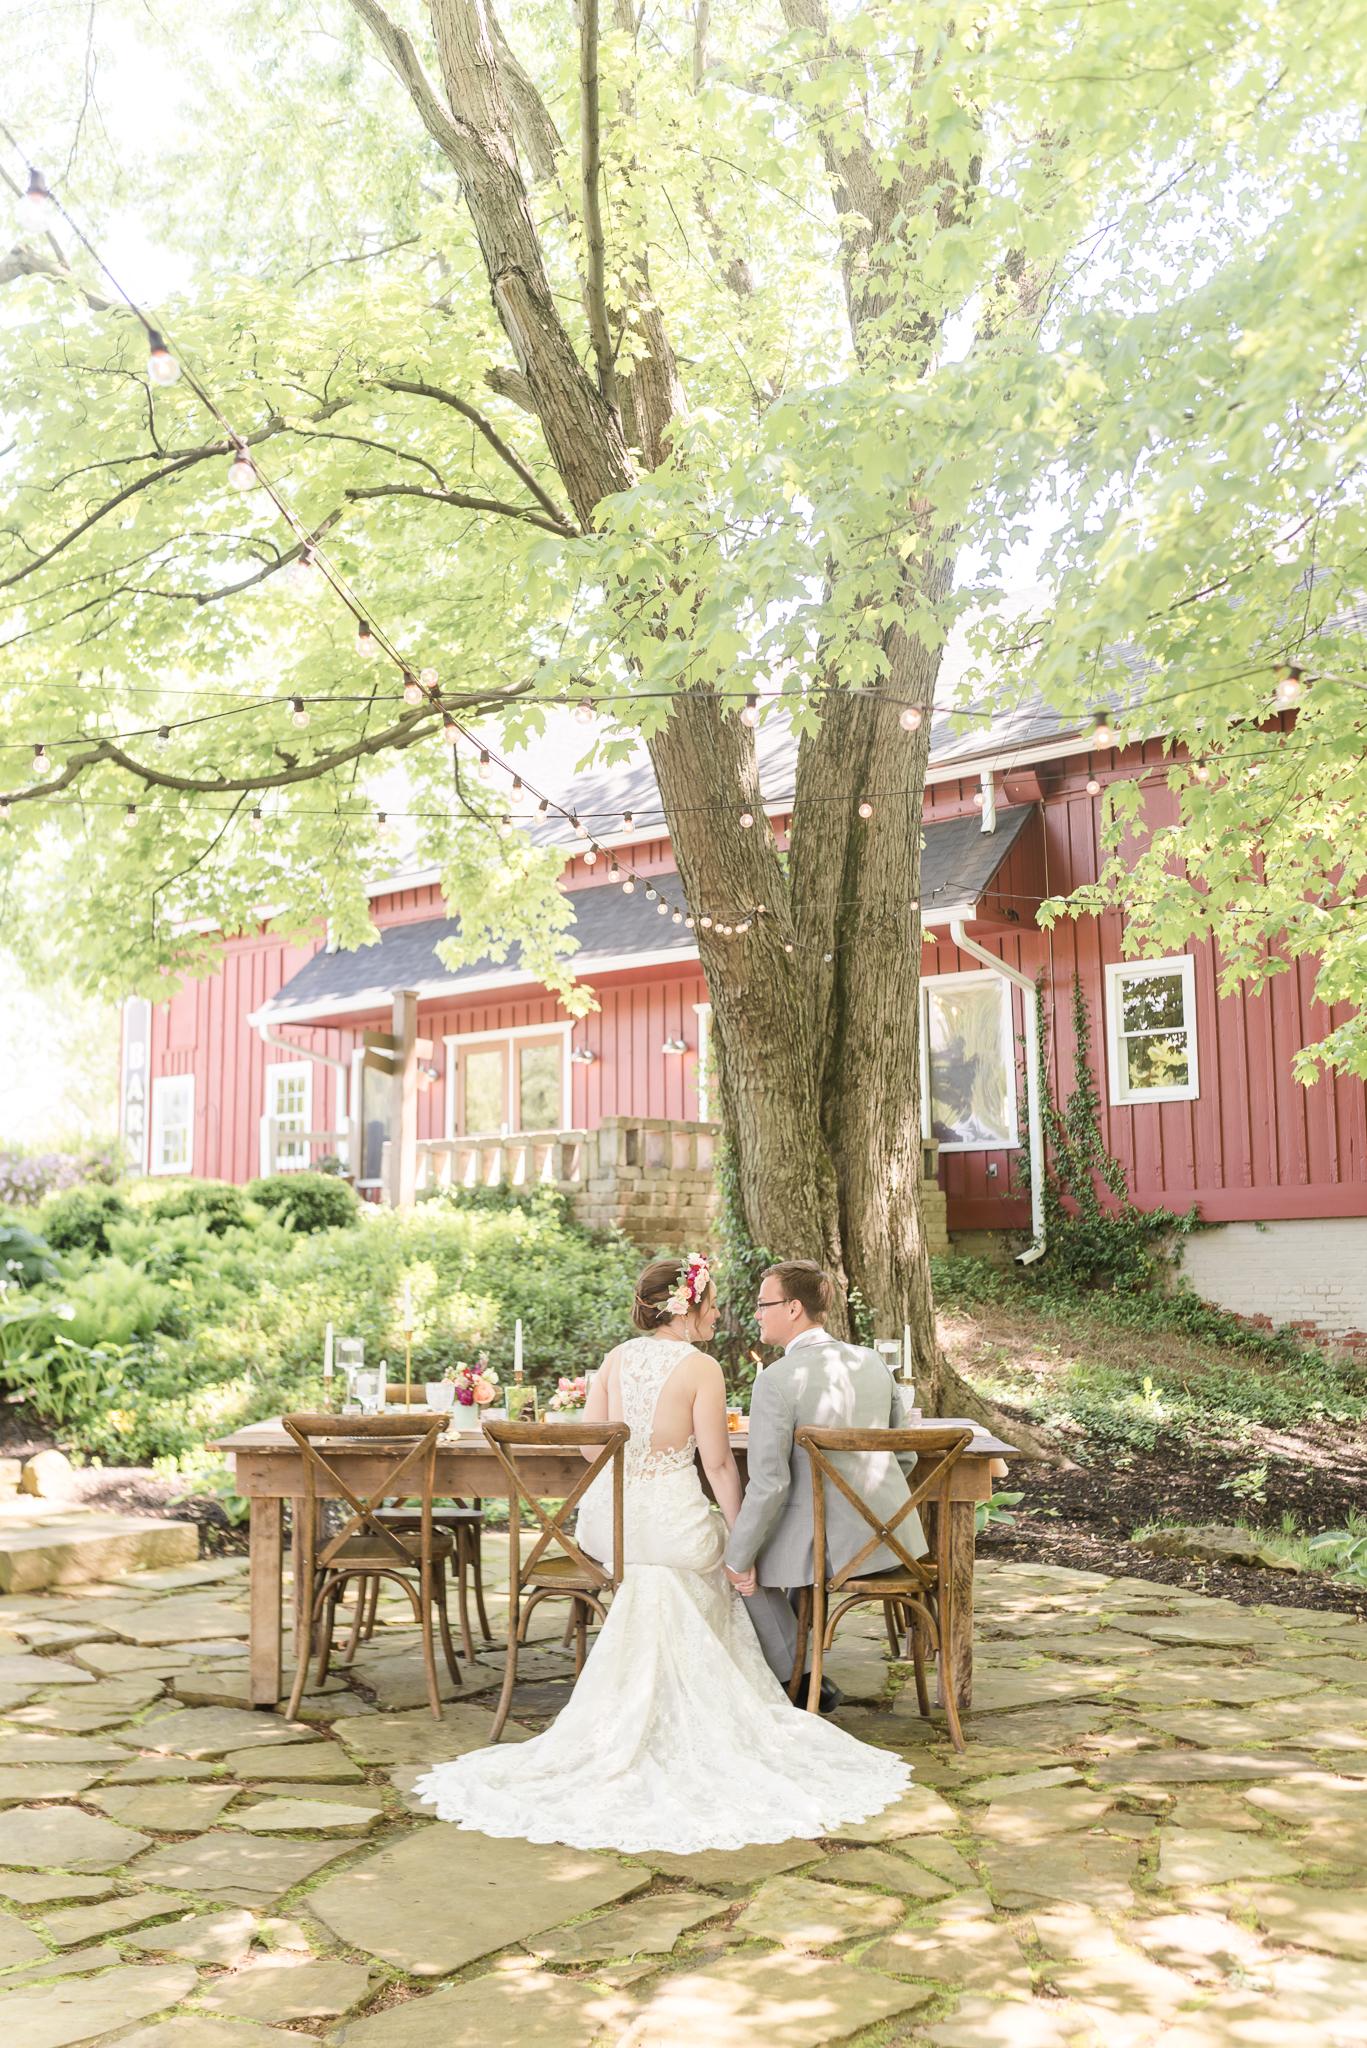 Mustard Seed Gardens Wedding Indianapolis Noblesvile Fishers Wedding Photographer-70.jpg